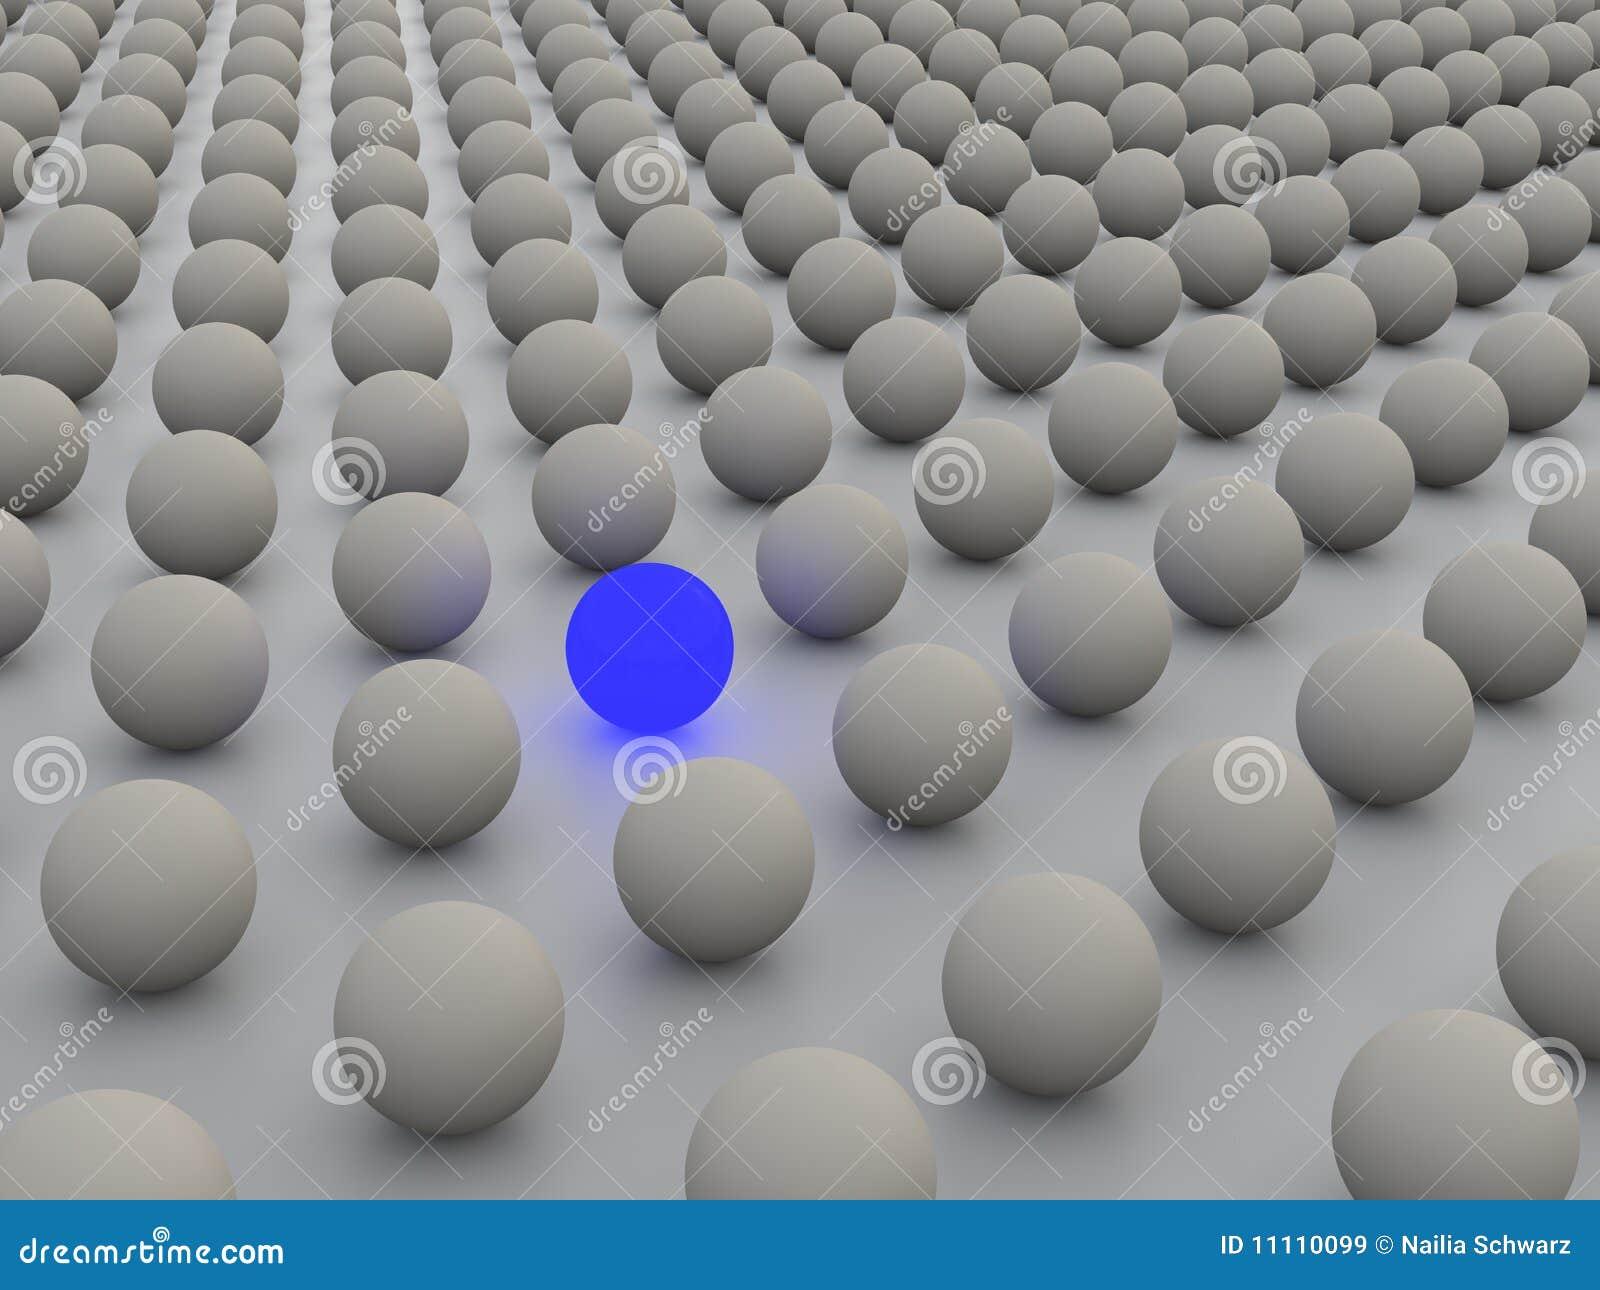 3D concept rendering depicting individualism